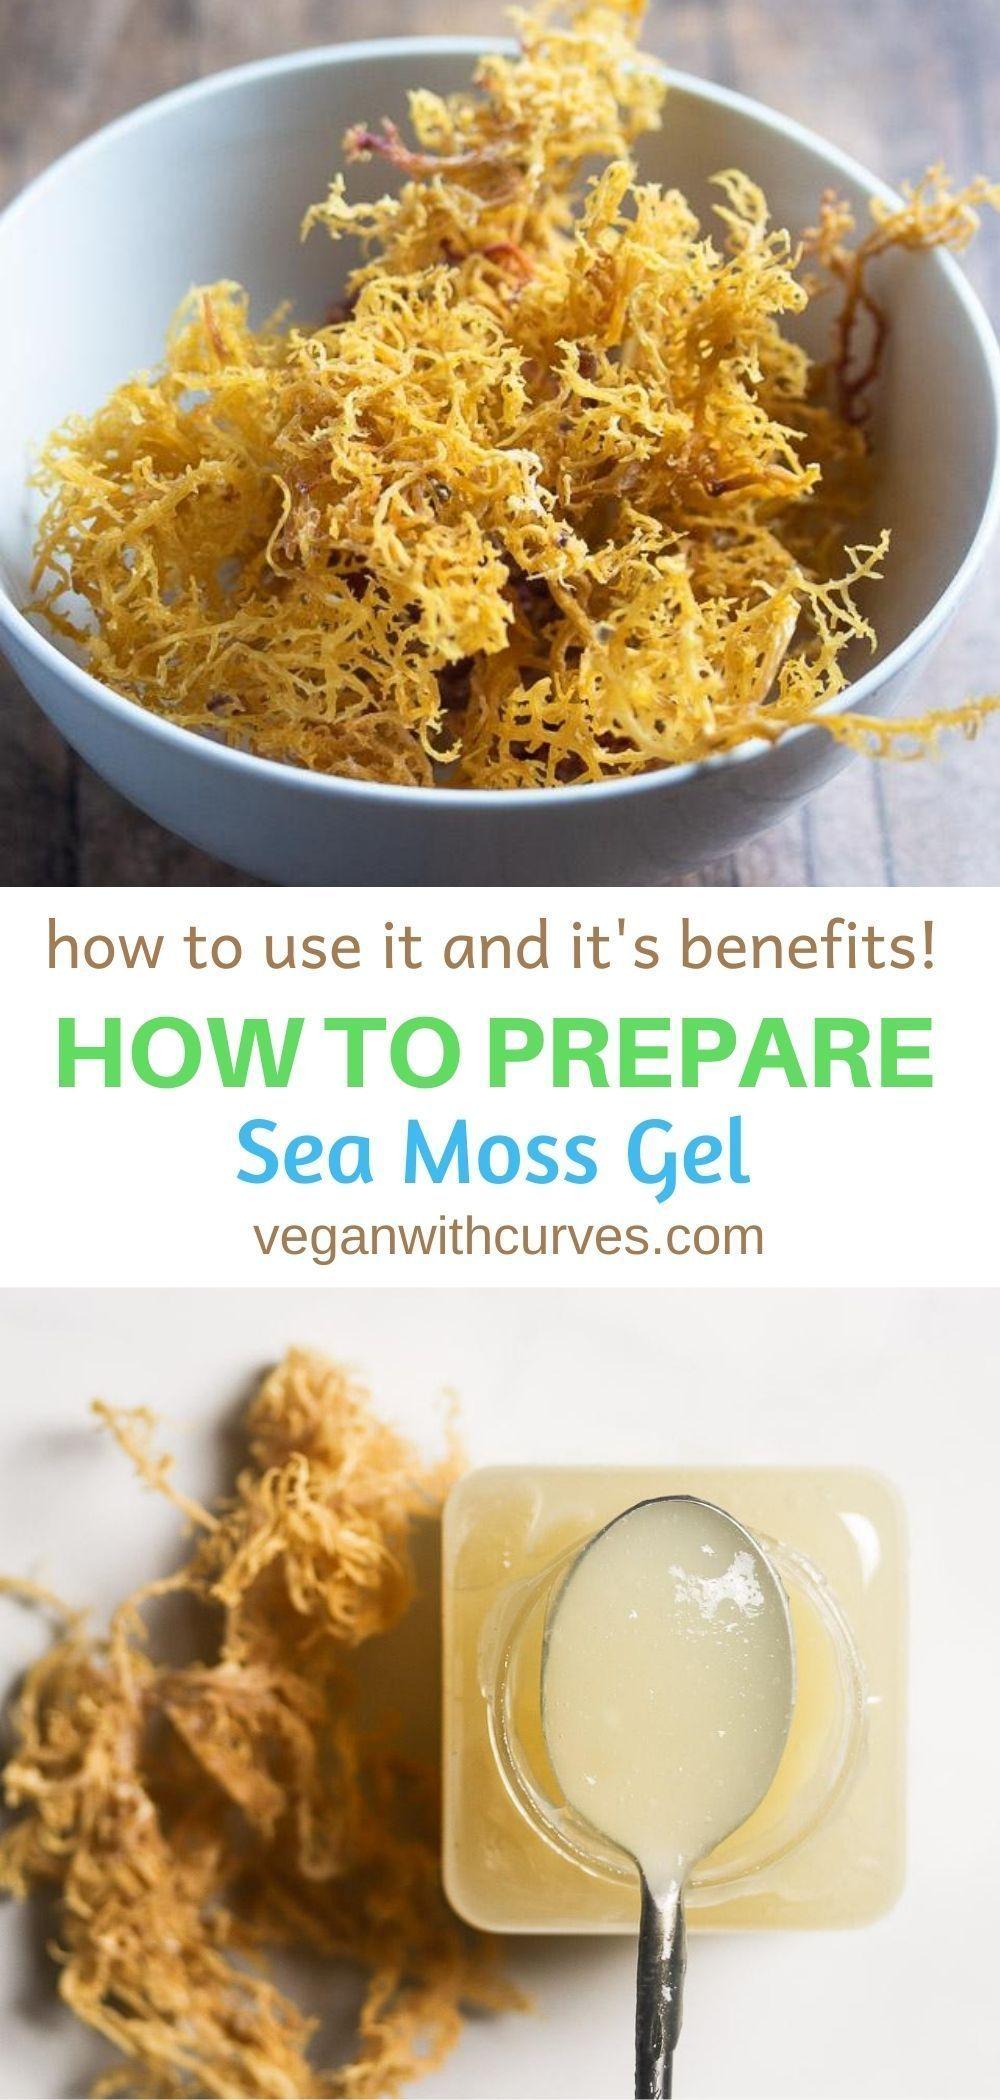 How To Make Sea Moss Gel Sea Moss Whole Food Recipes Healthy Recipes